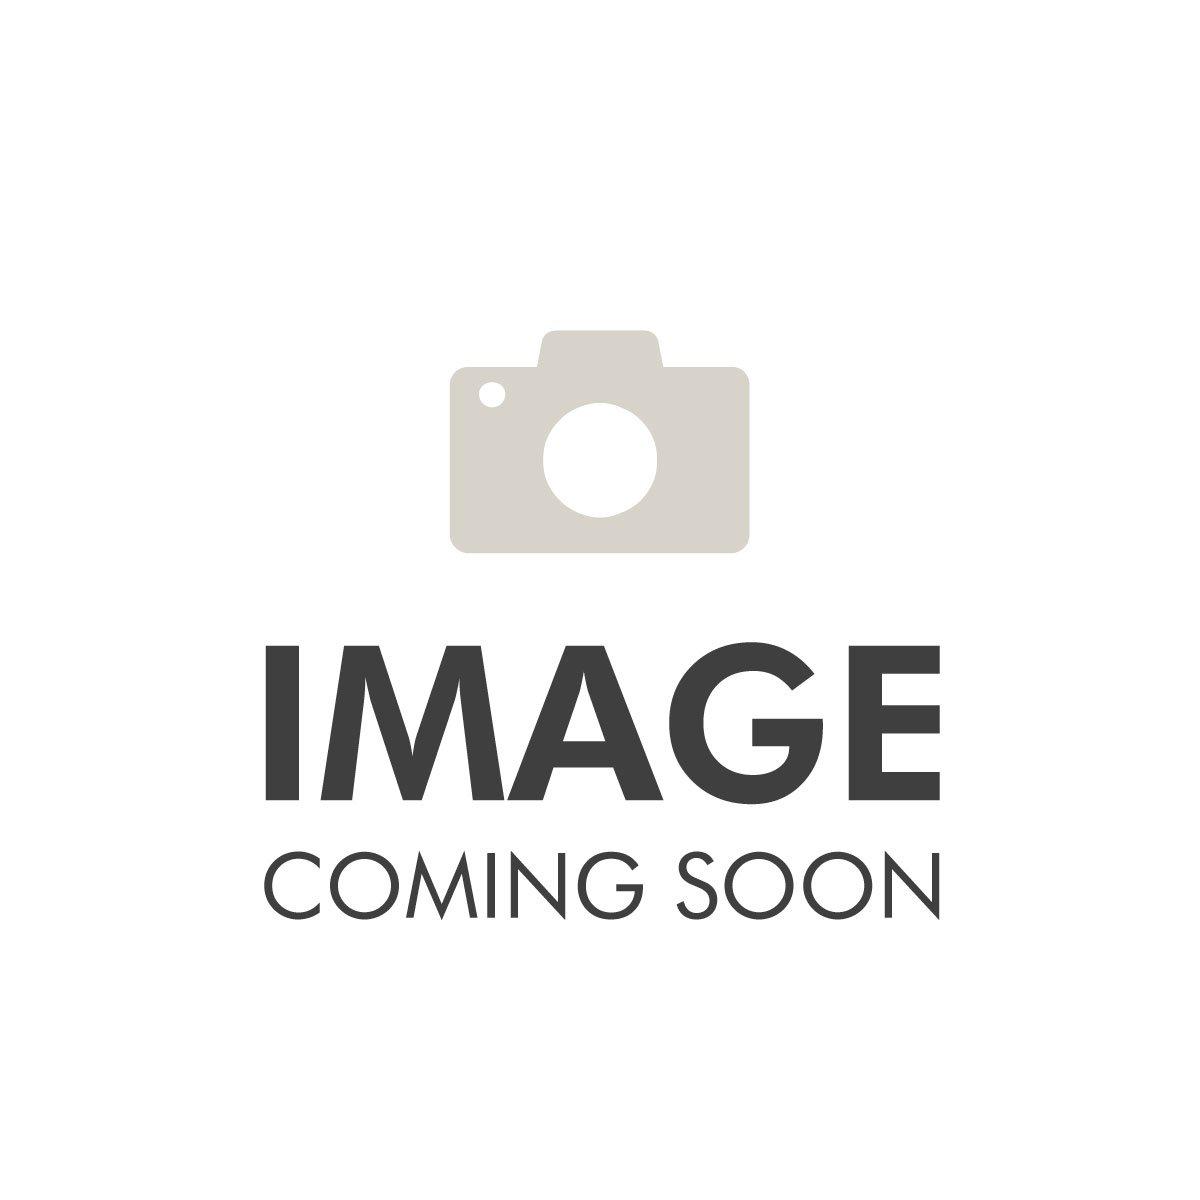 Uhlmann - Paille isolante - 10-Pack